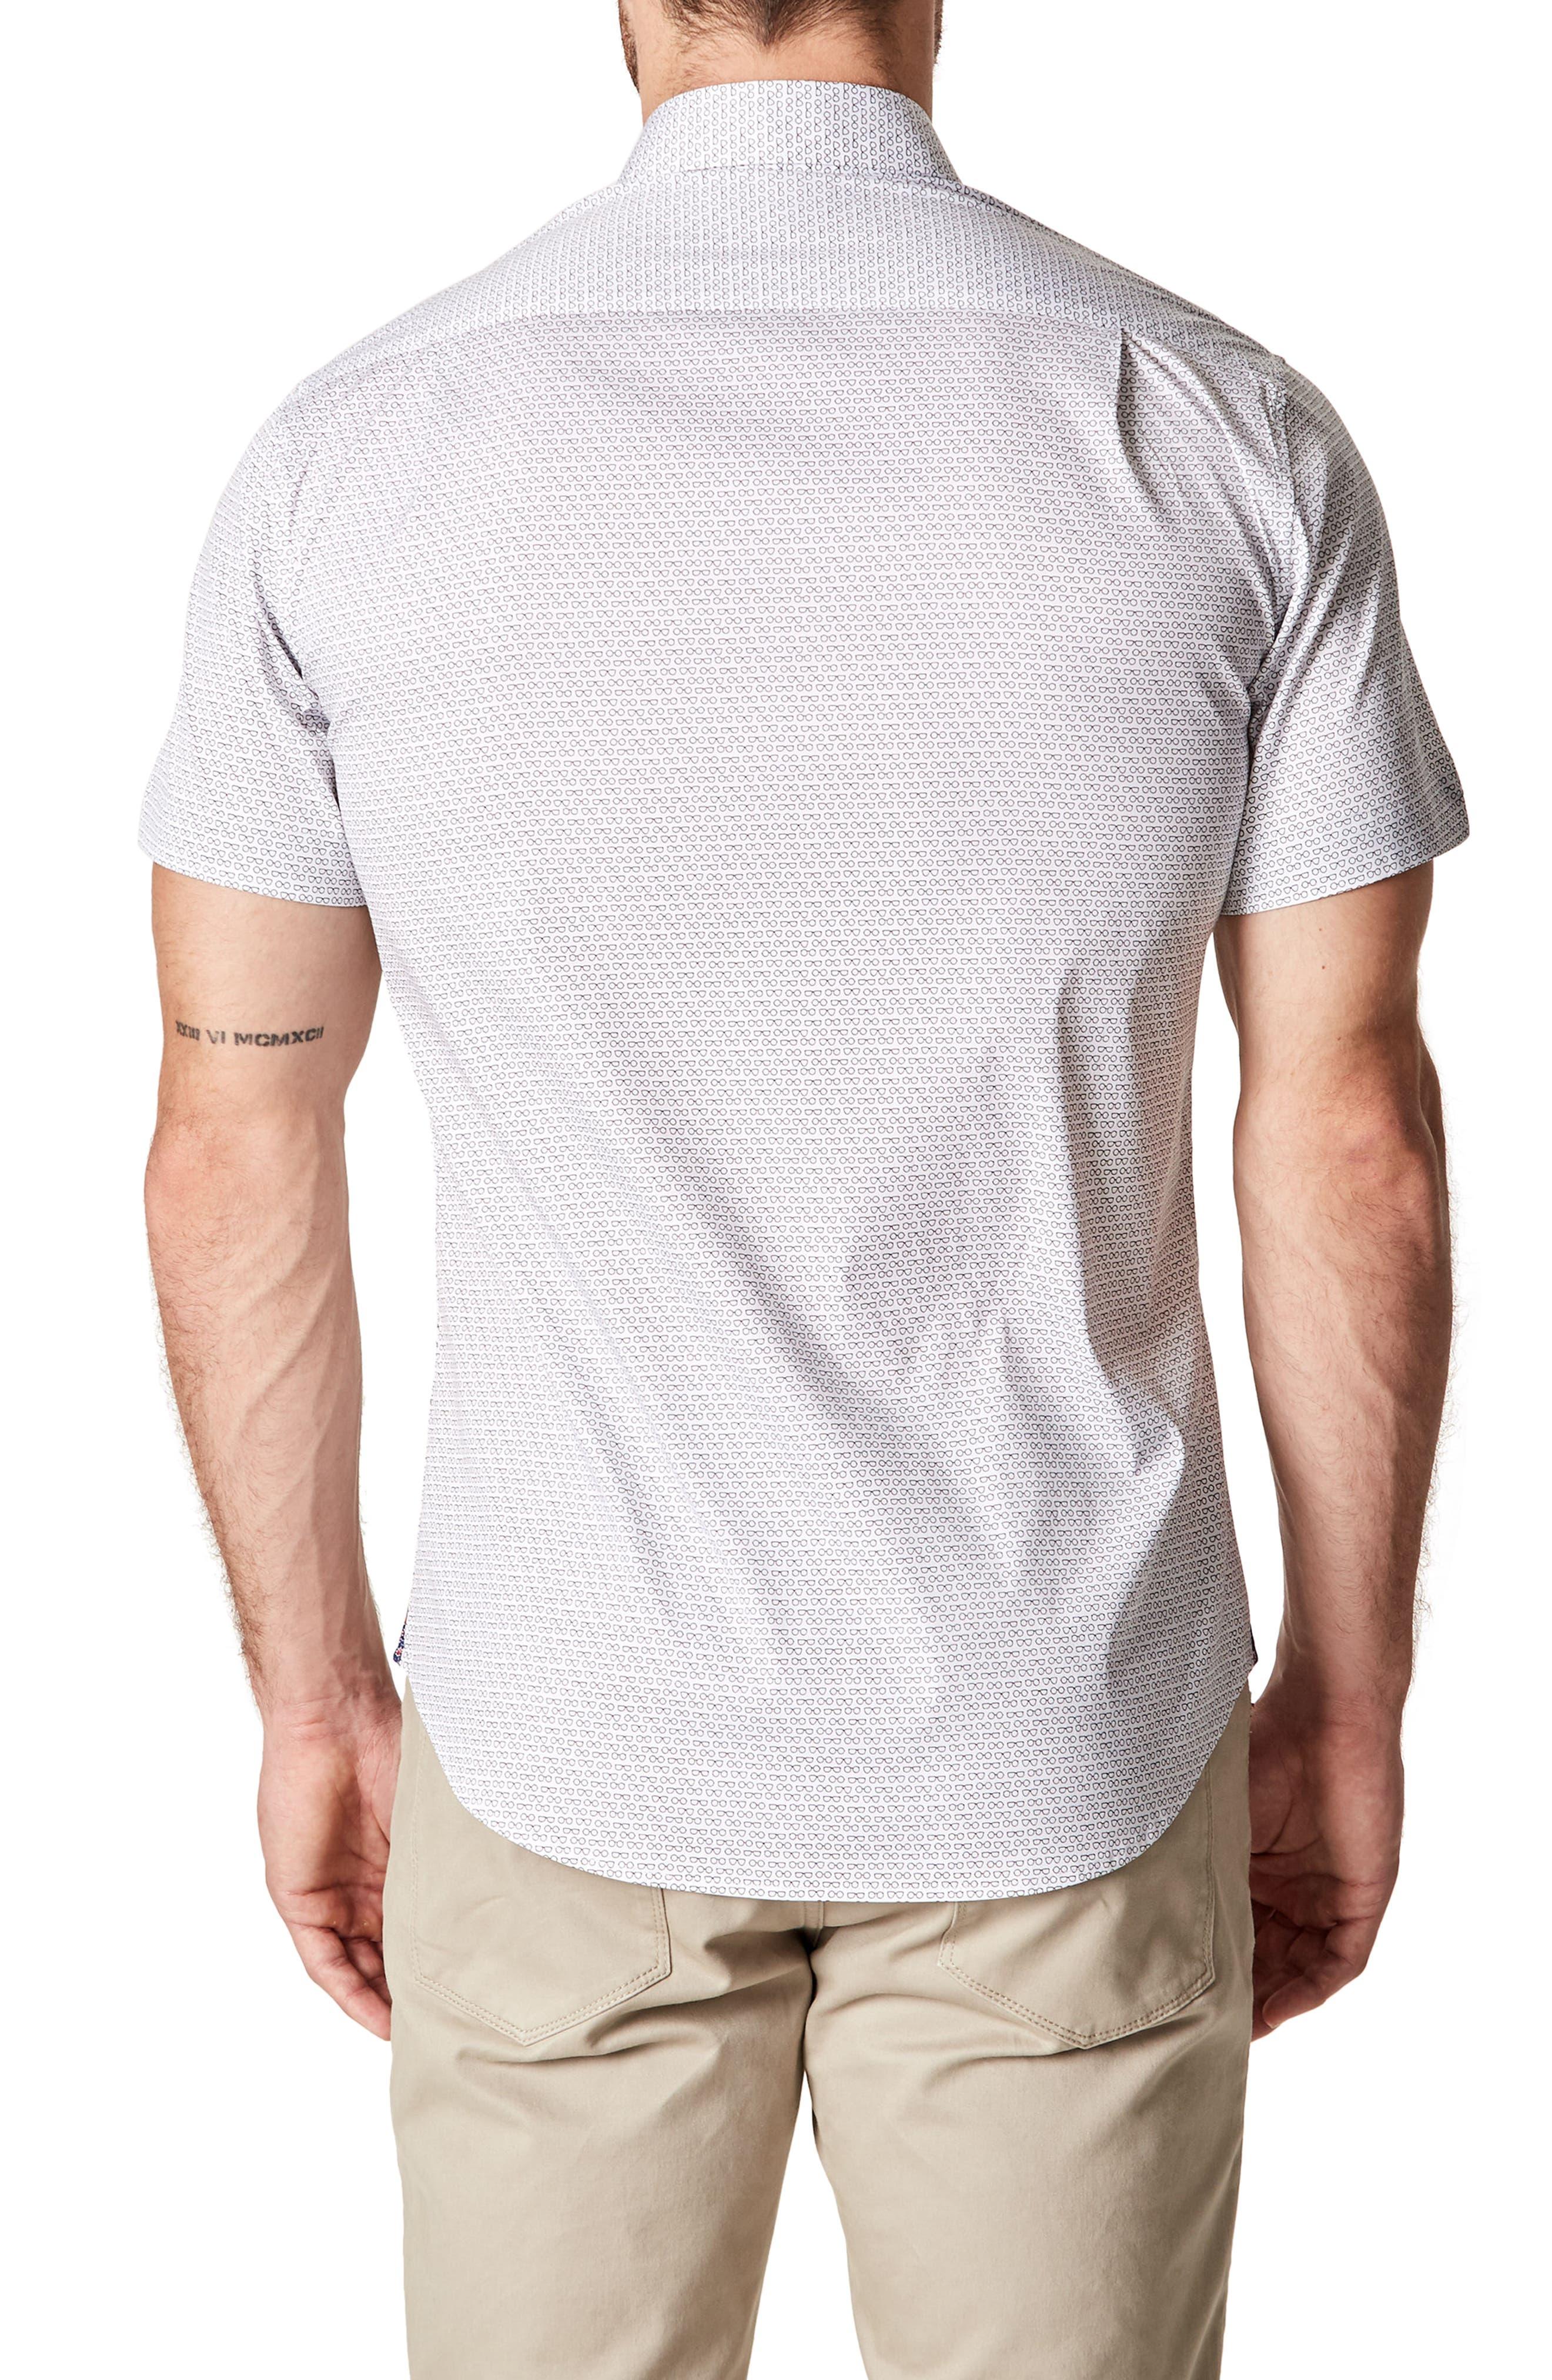 Bright Life Woven Shirt,                             Alternate thumbnail 2, color,                             White